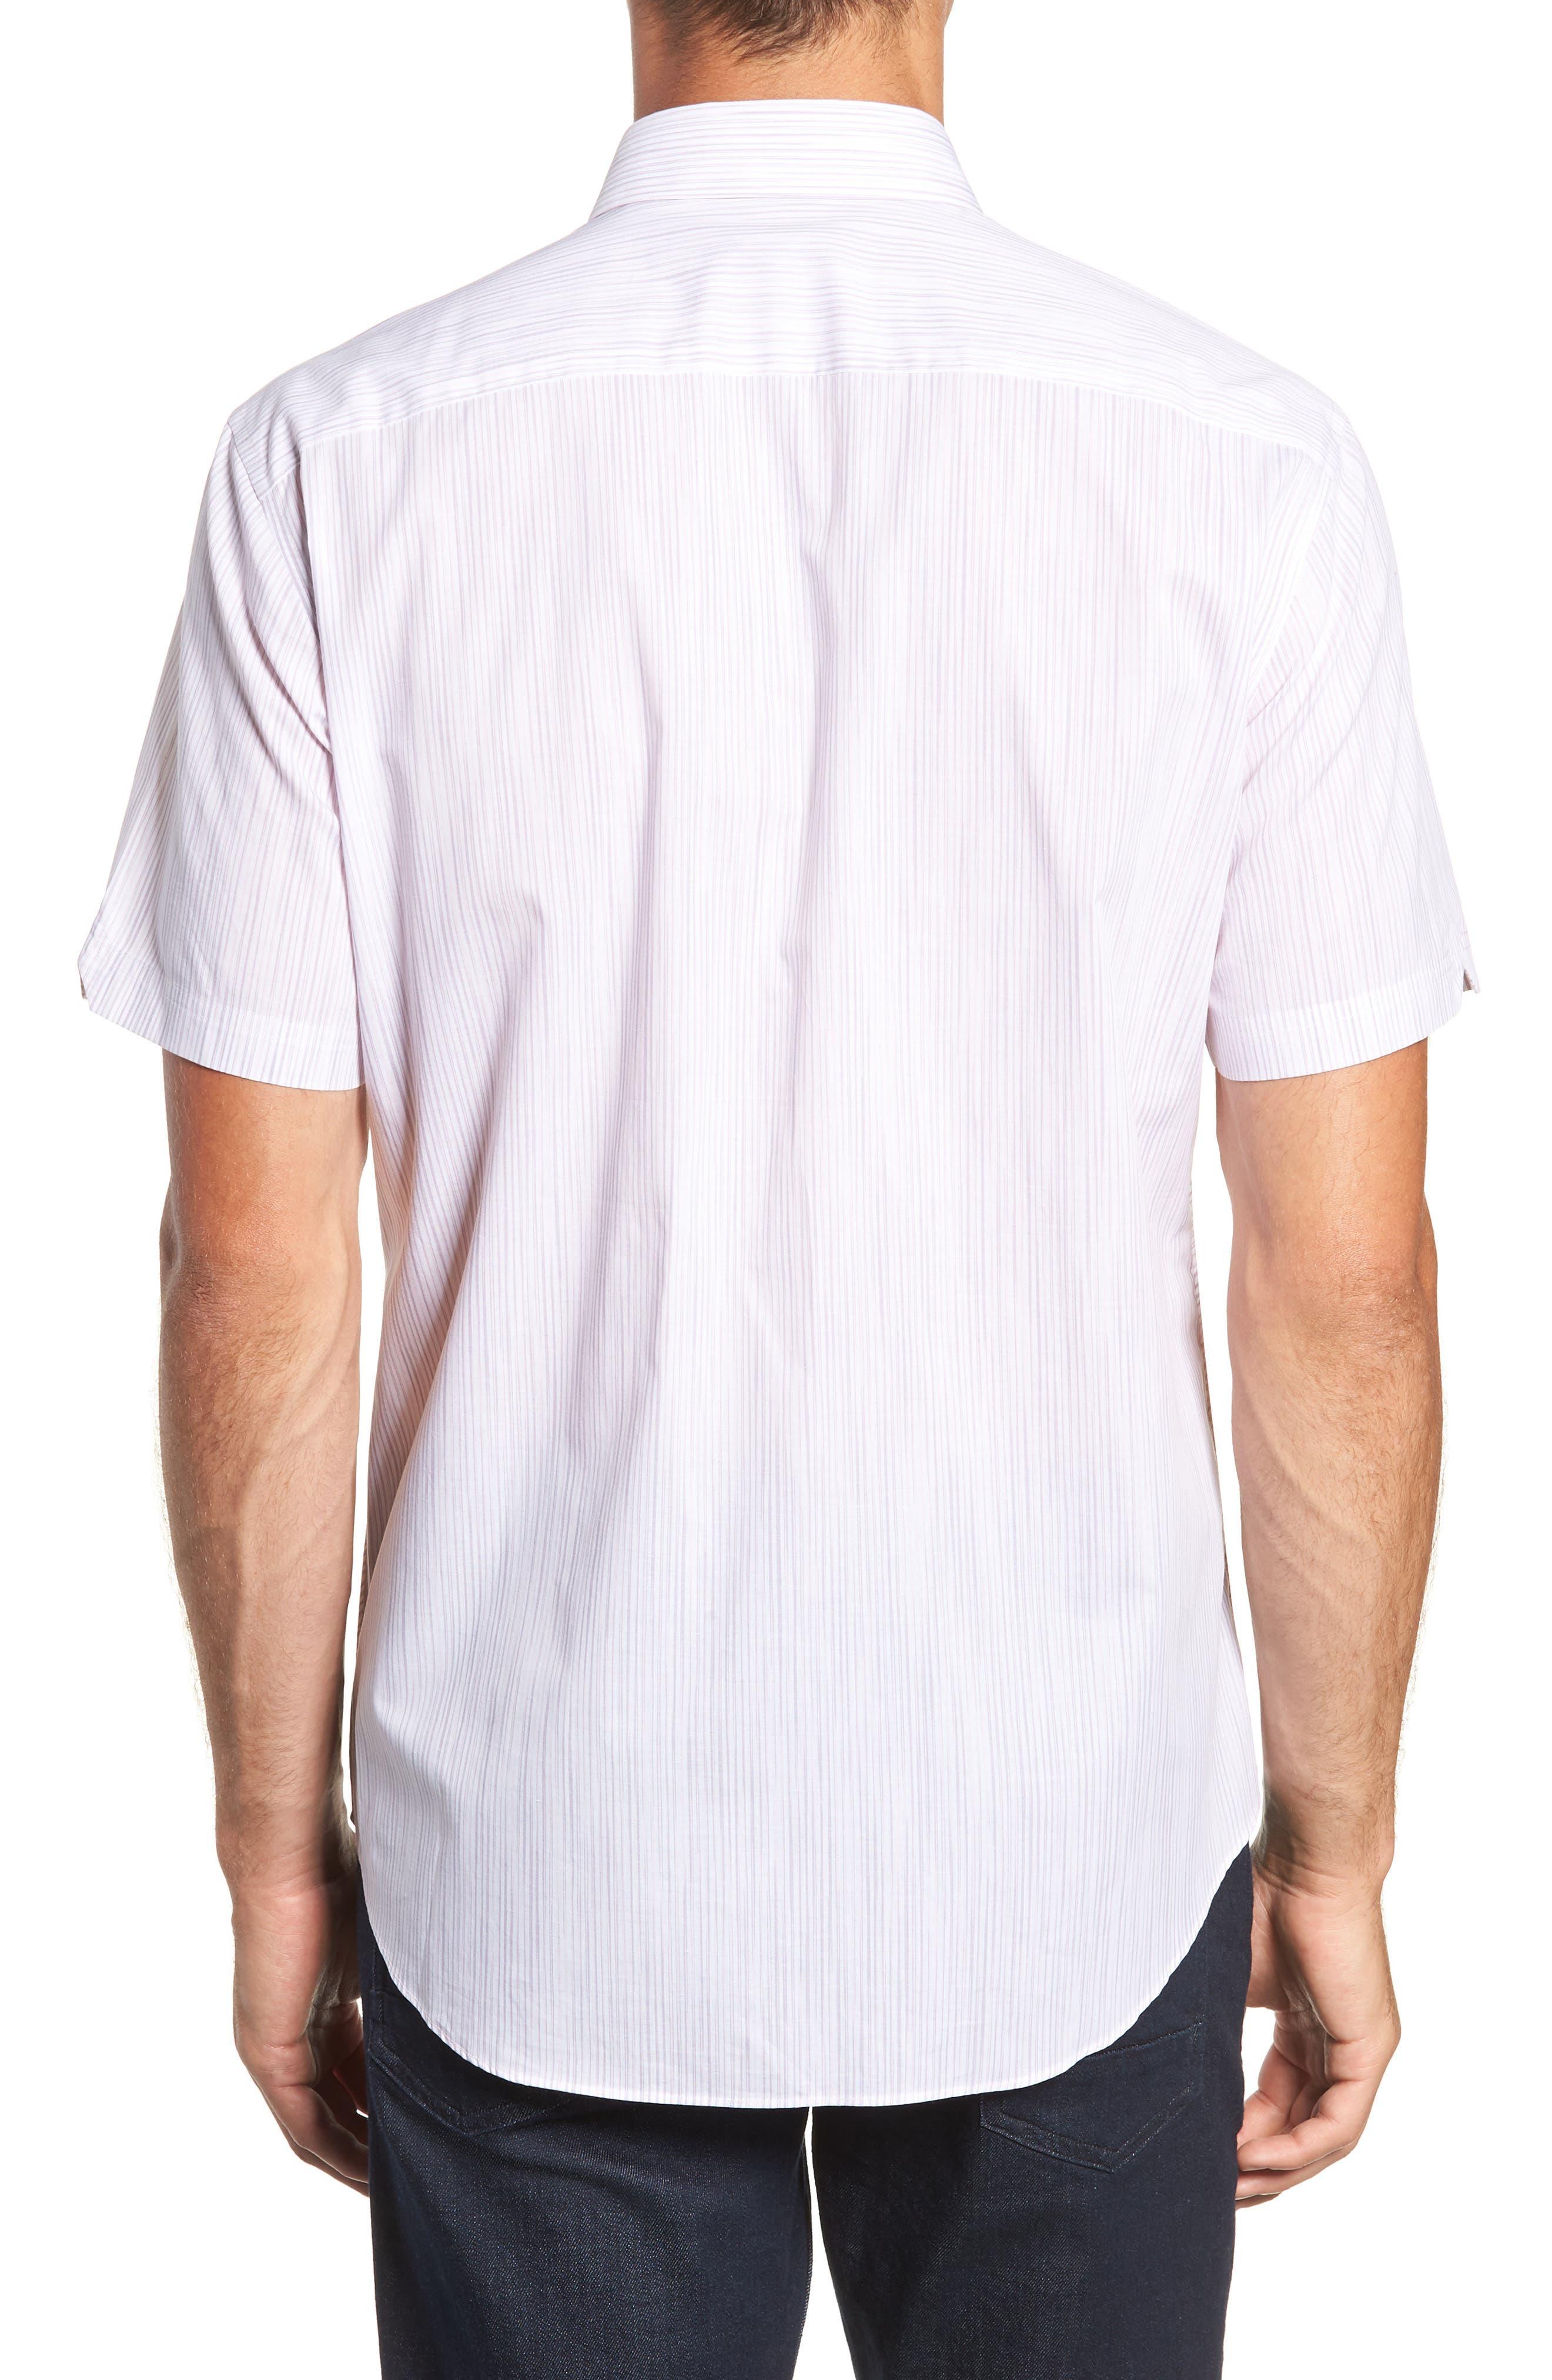 Bella Regular Fit Sport Shirt,                             Alternate thumbnail 3, color,                             LIGHT PINK